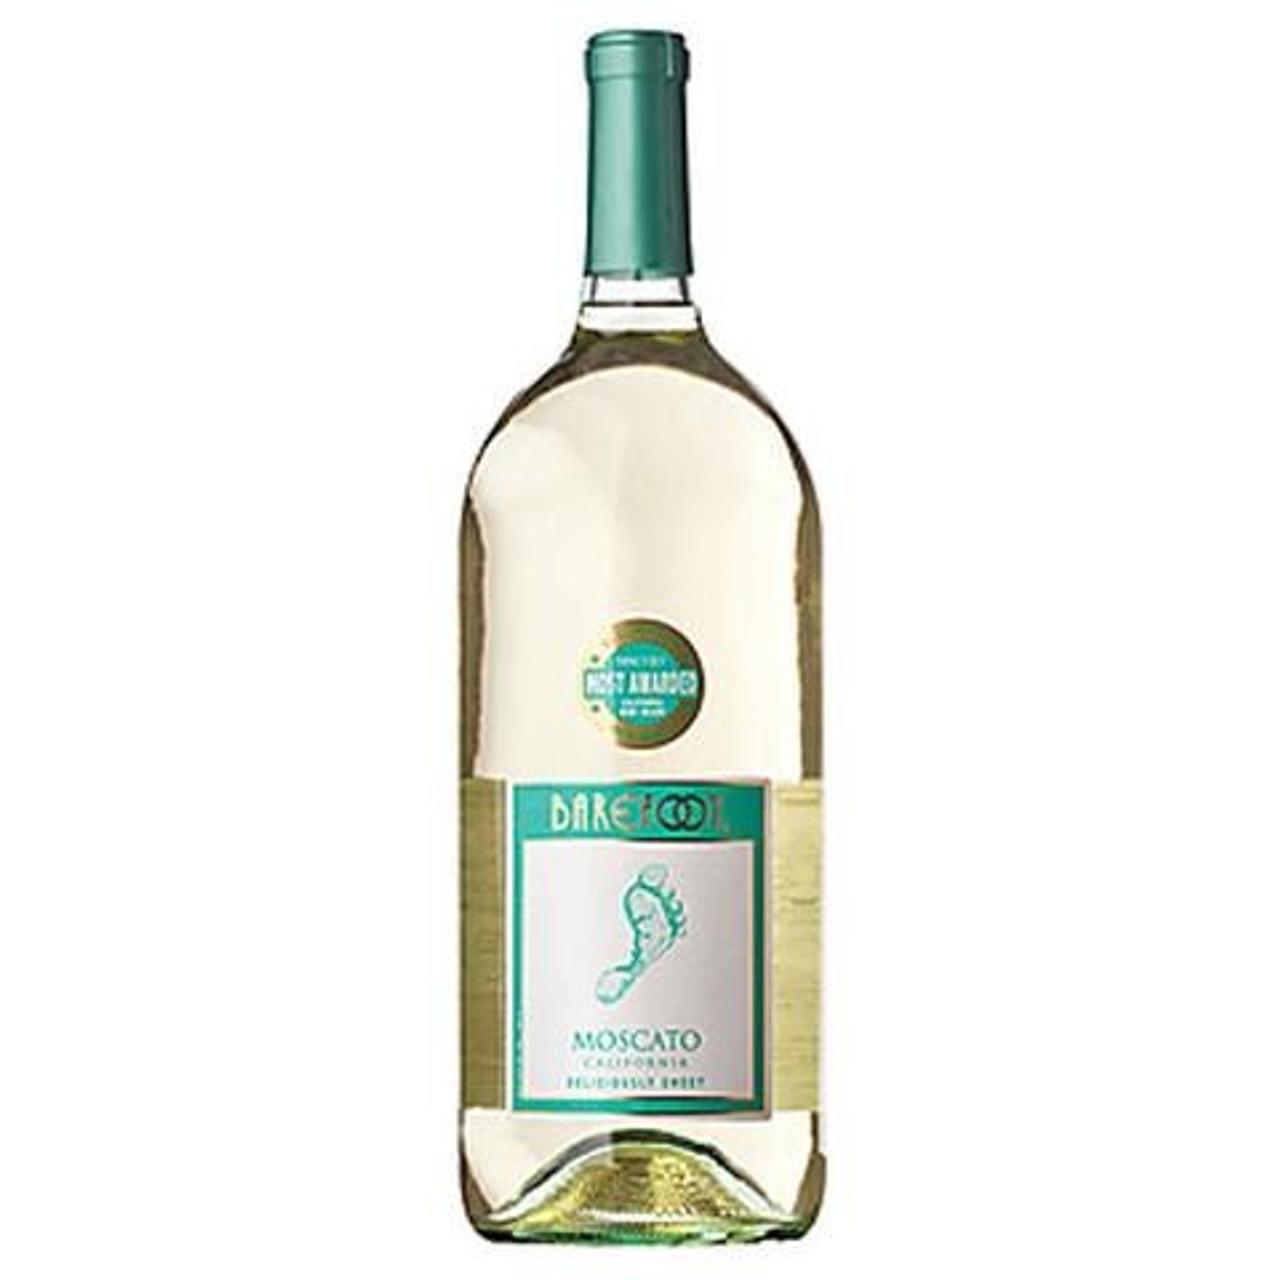 Barefoot Moscato Sweet White Wine - 1.5 L Bottle